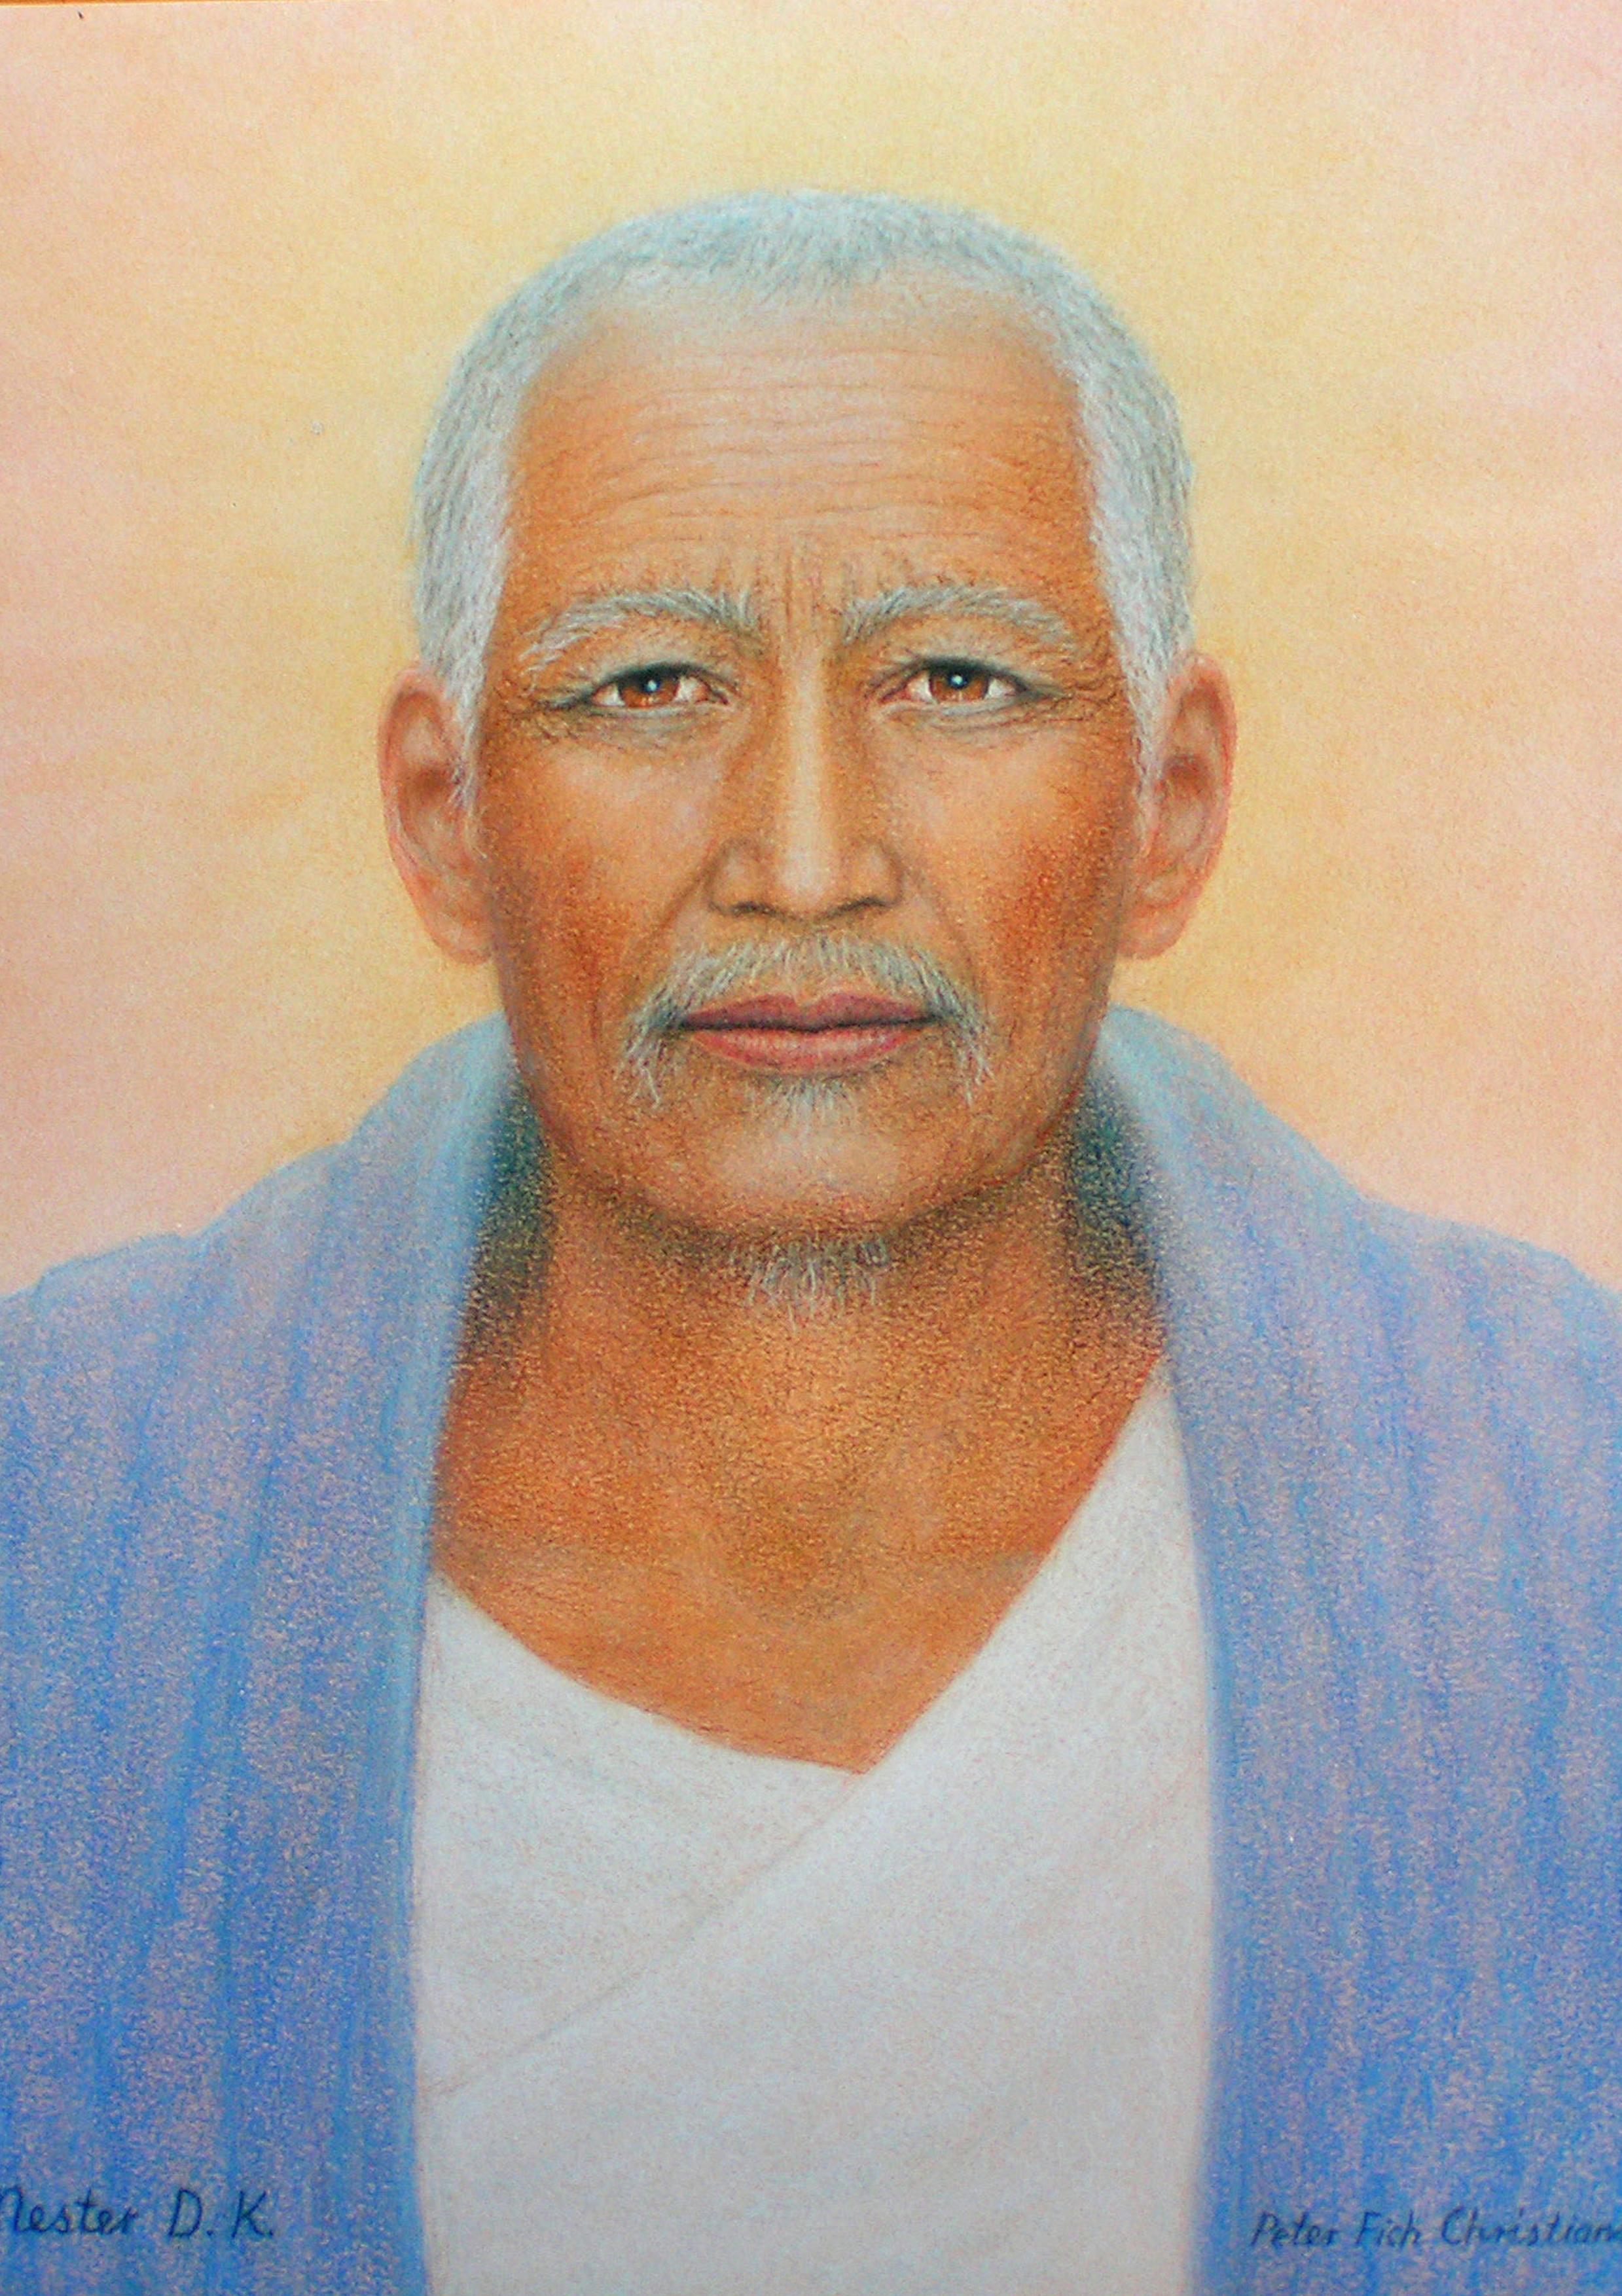 Djwhal Khul (D.K.)